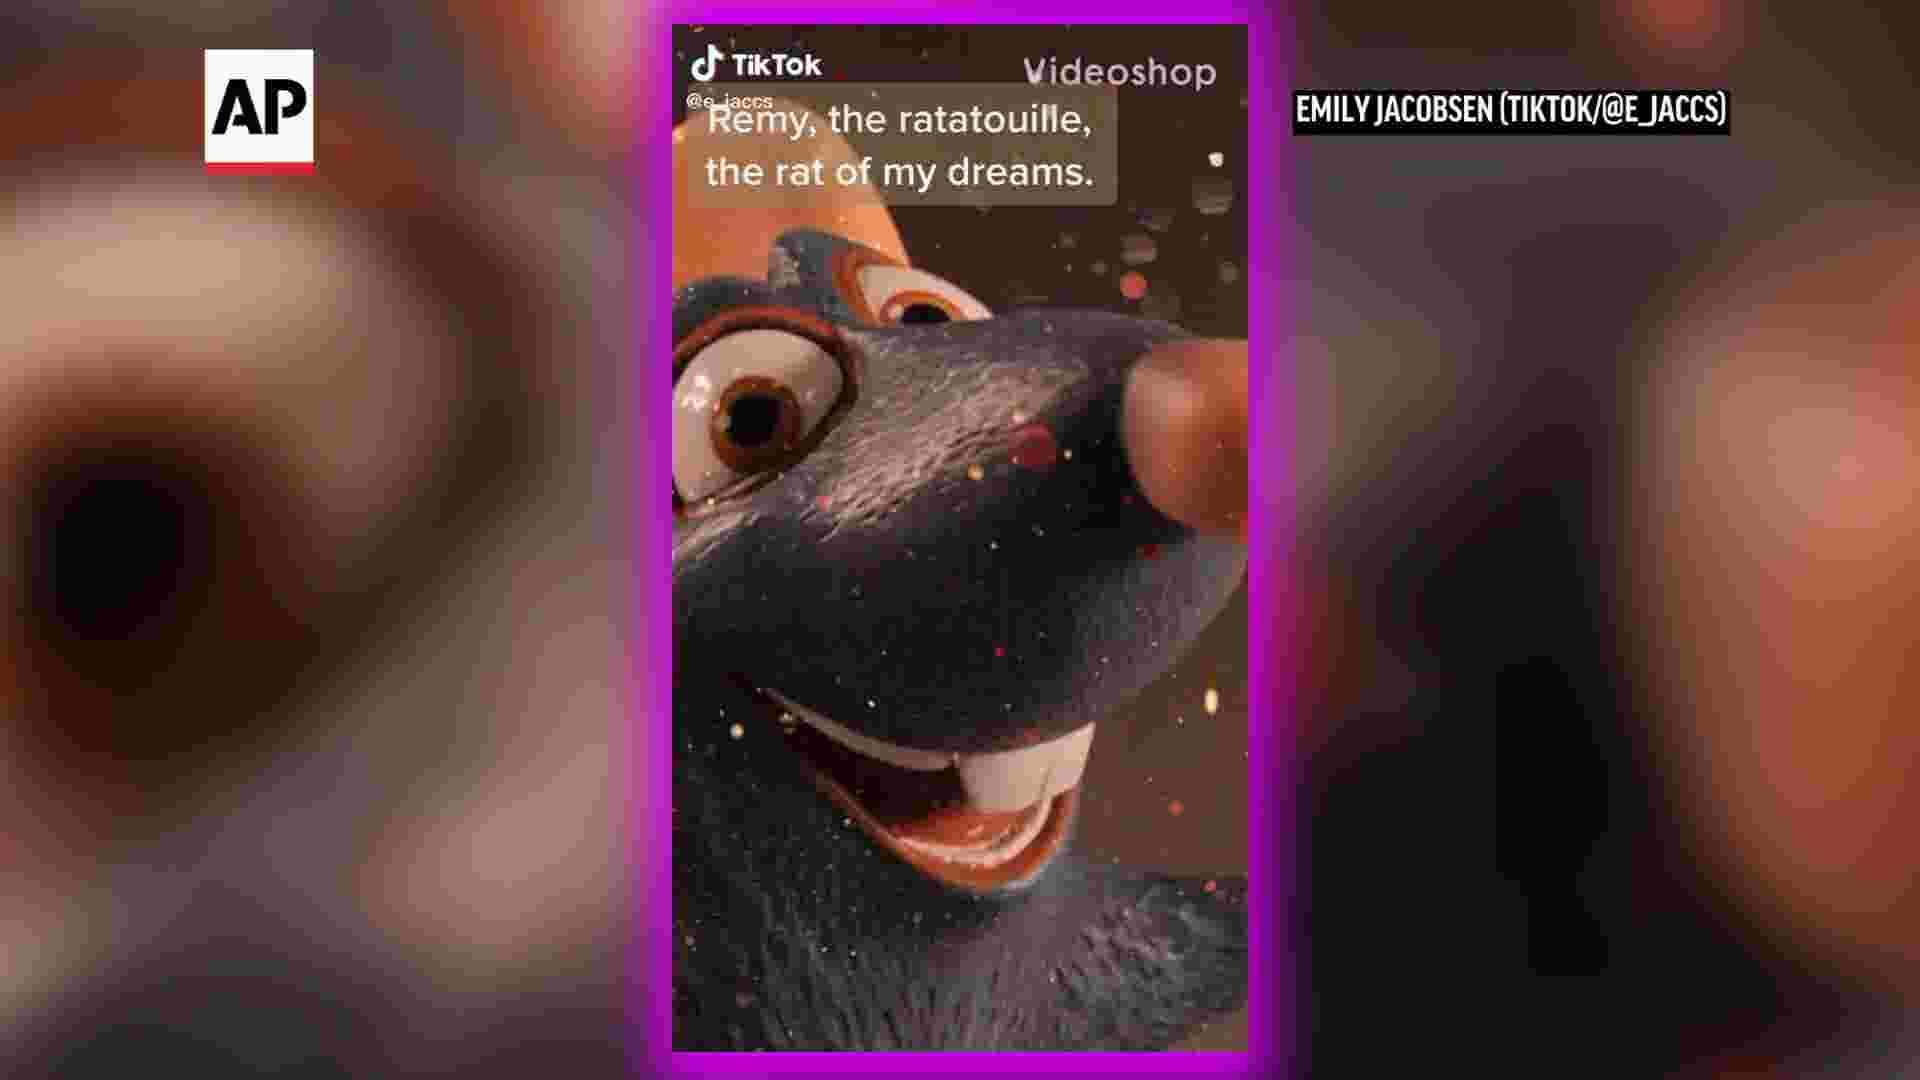 TikTok users create viral 'Ratatouille' musical